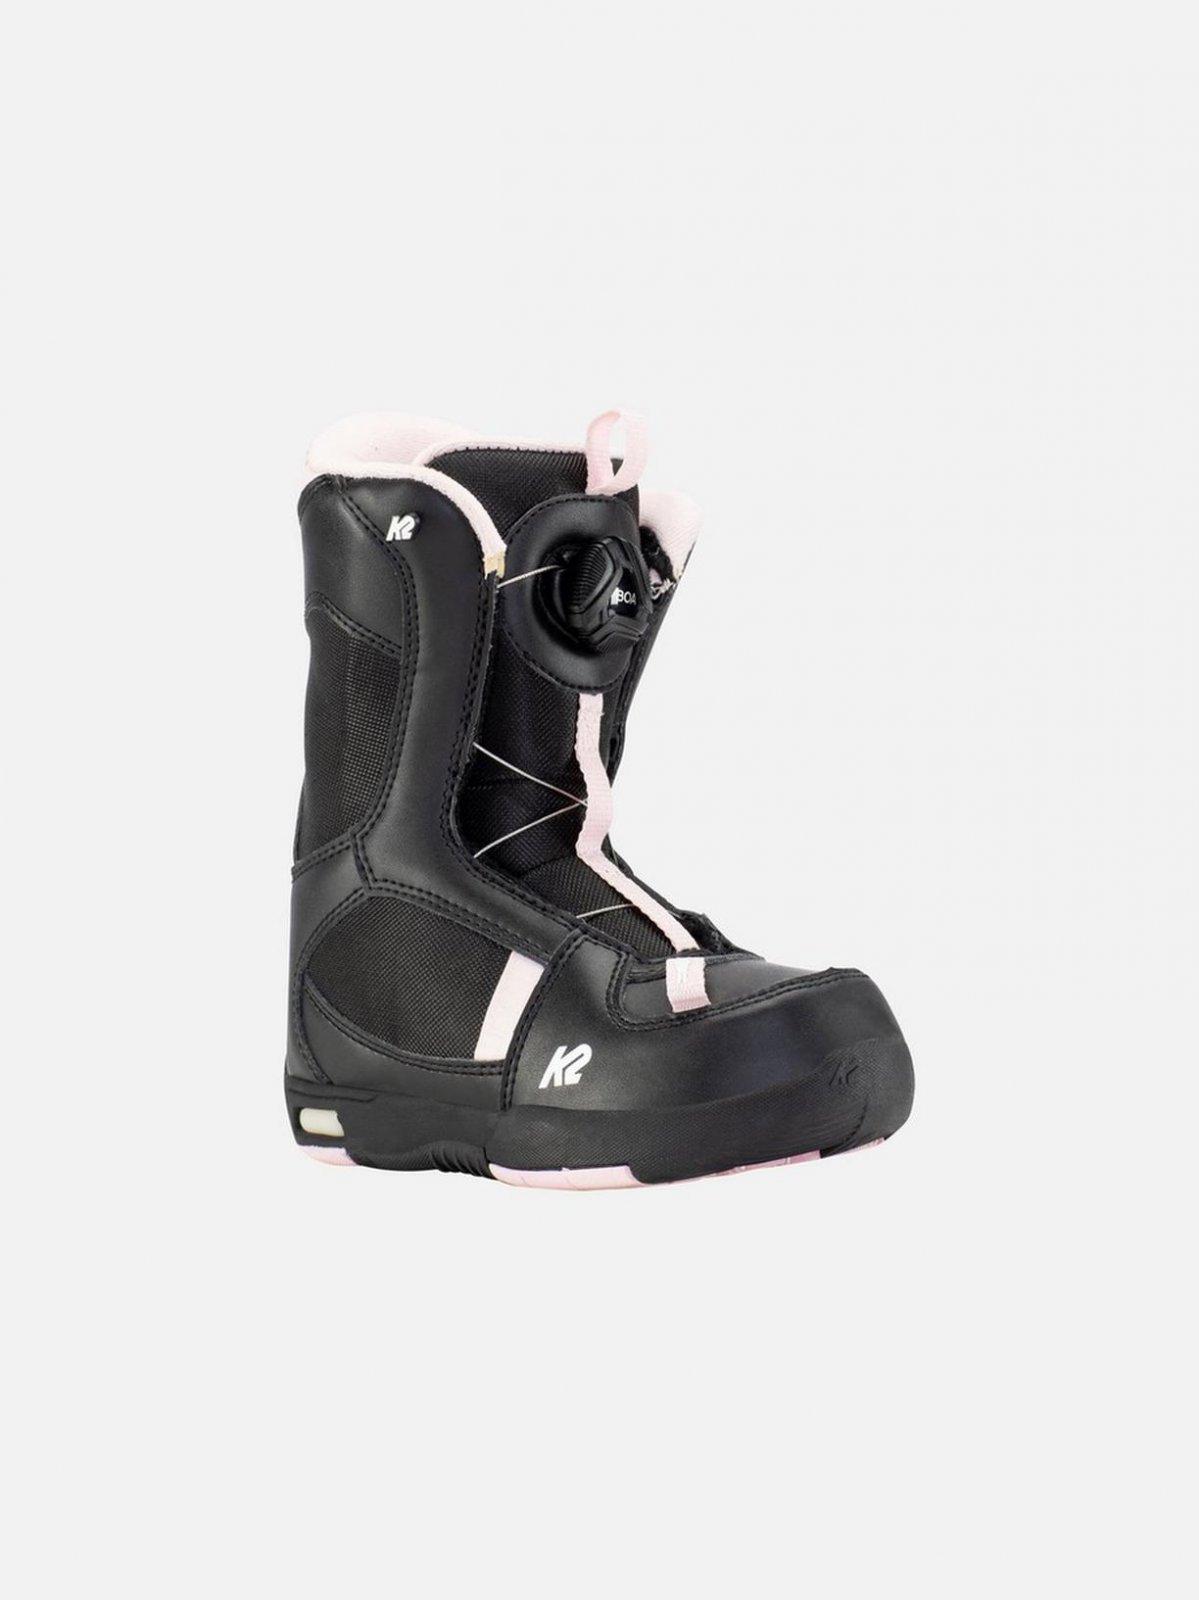 2021 K2 Lil Kat Junior Snowboard Boot